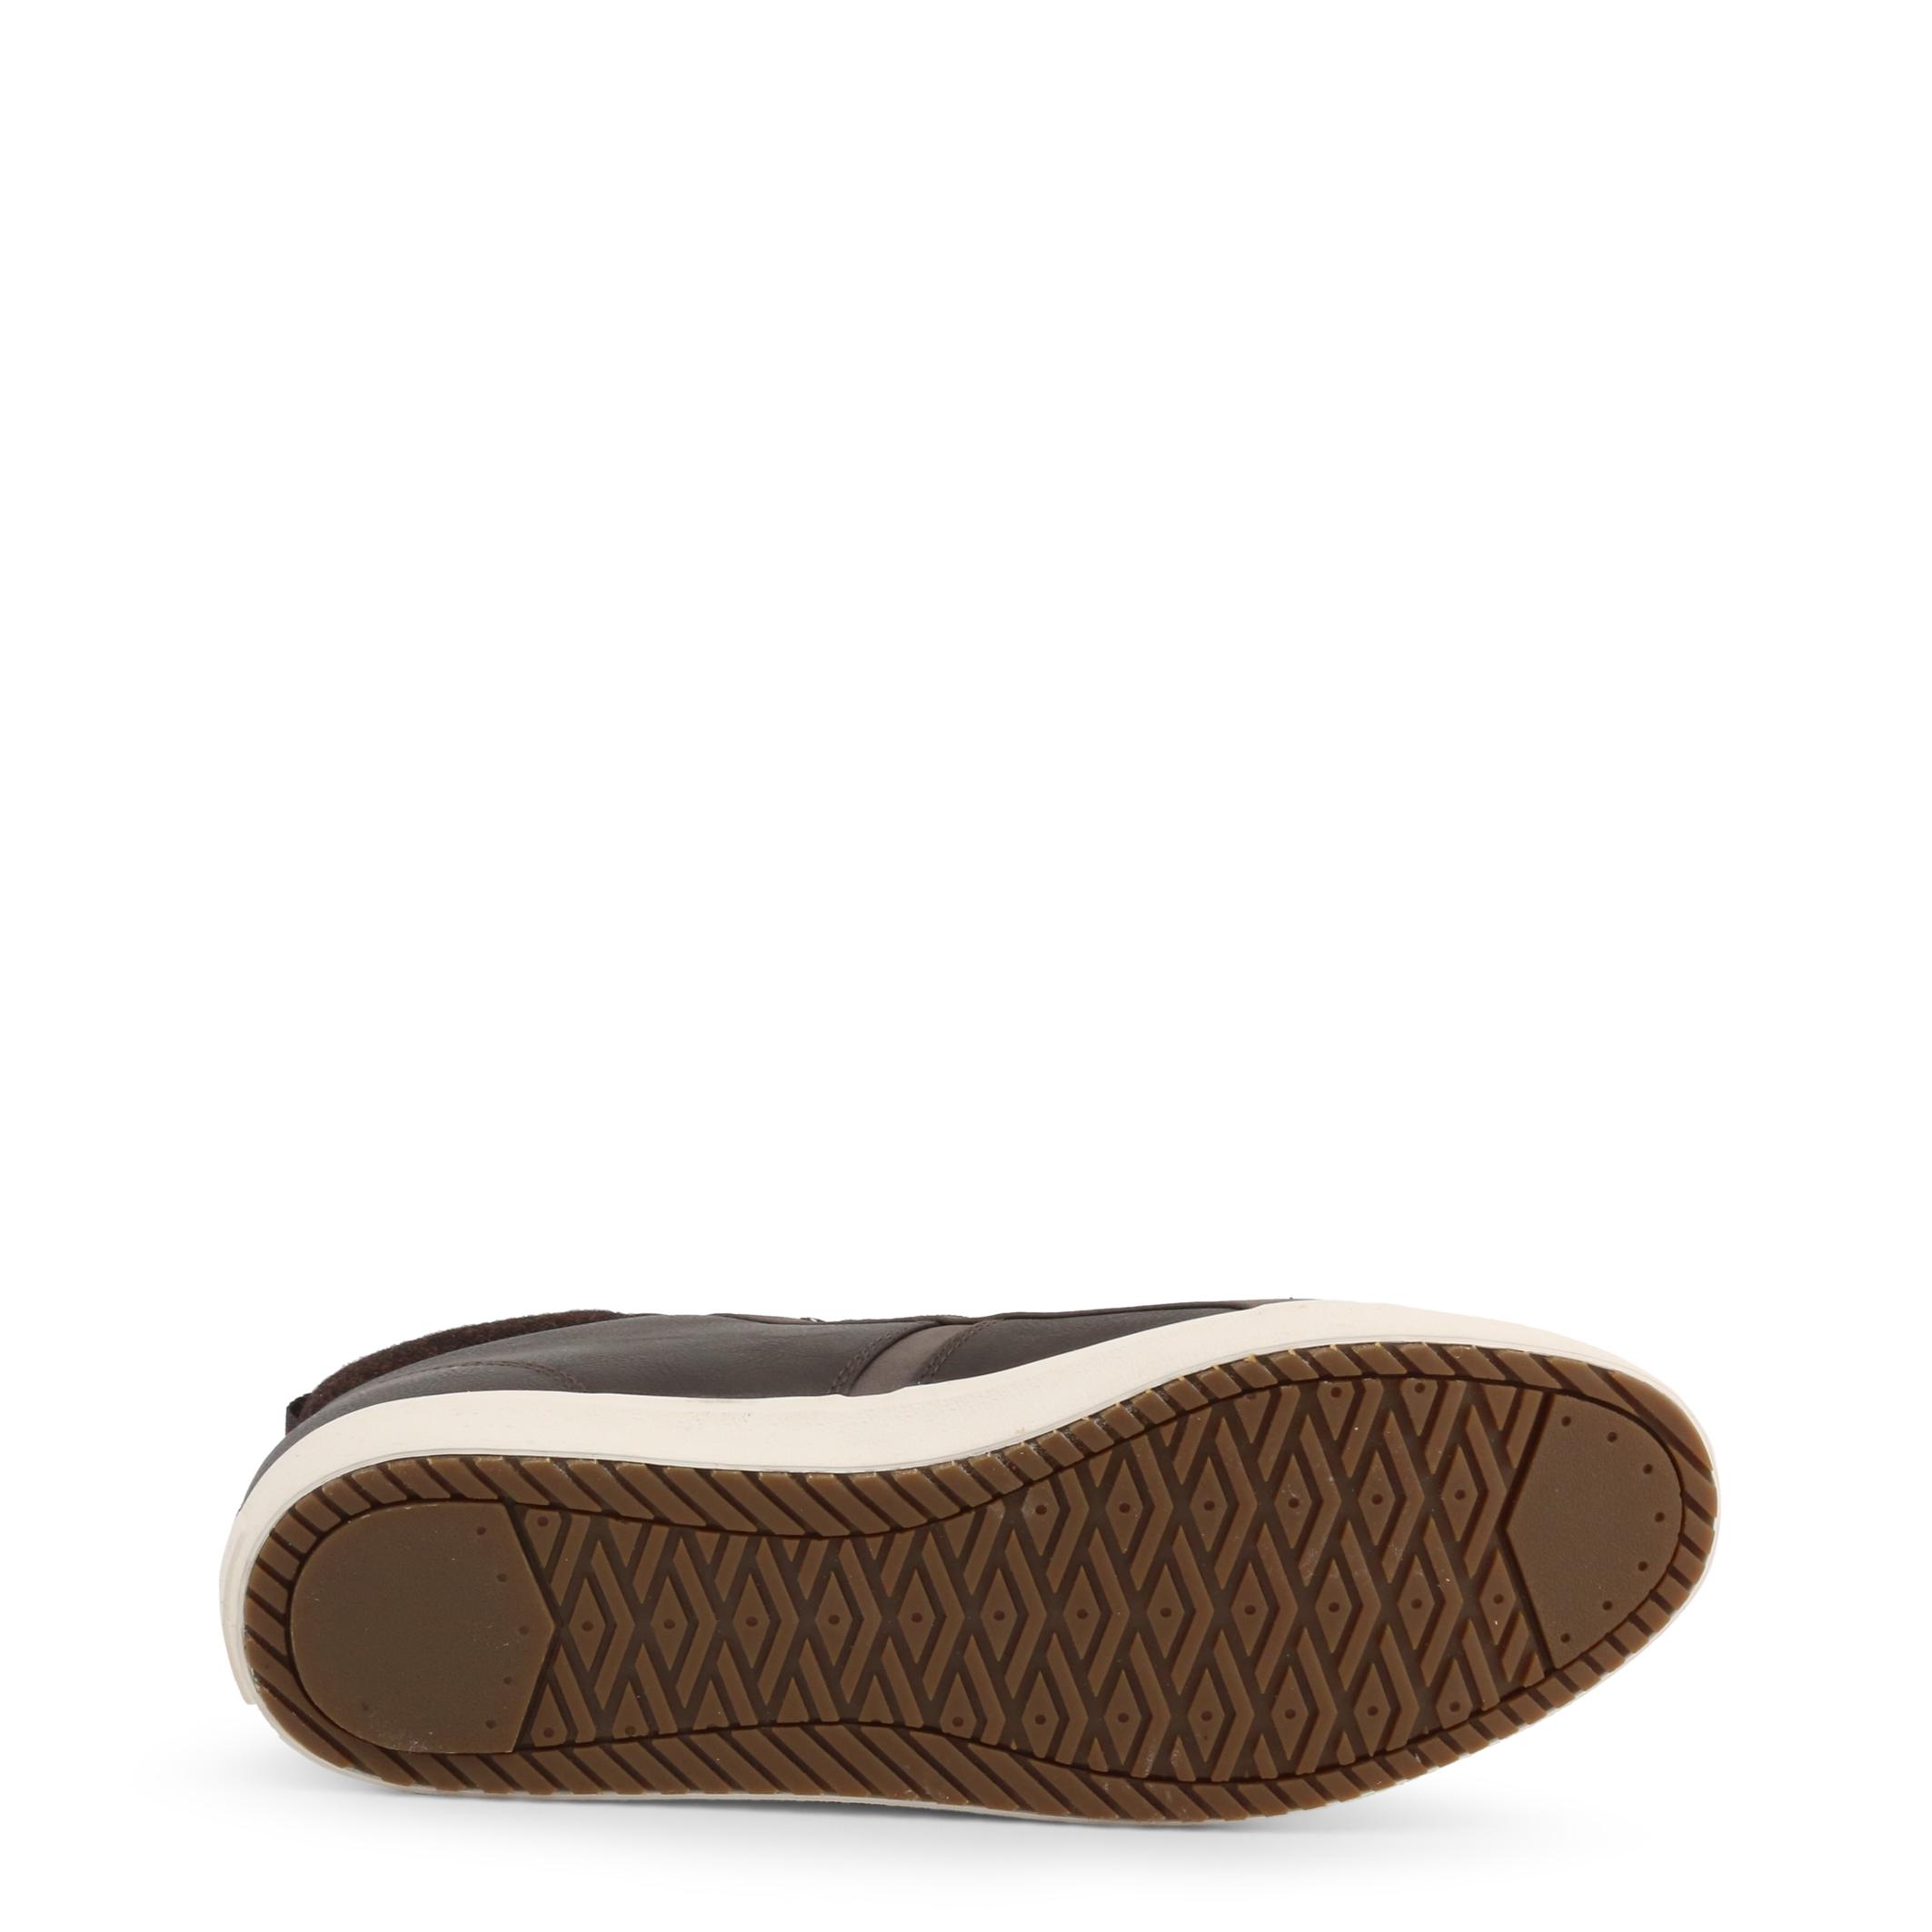 Chaussures de ville  U.S. Polo Assn. WOUCK7147W9_Y1_DKBR brown